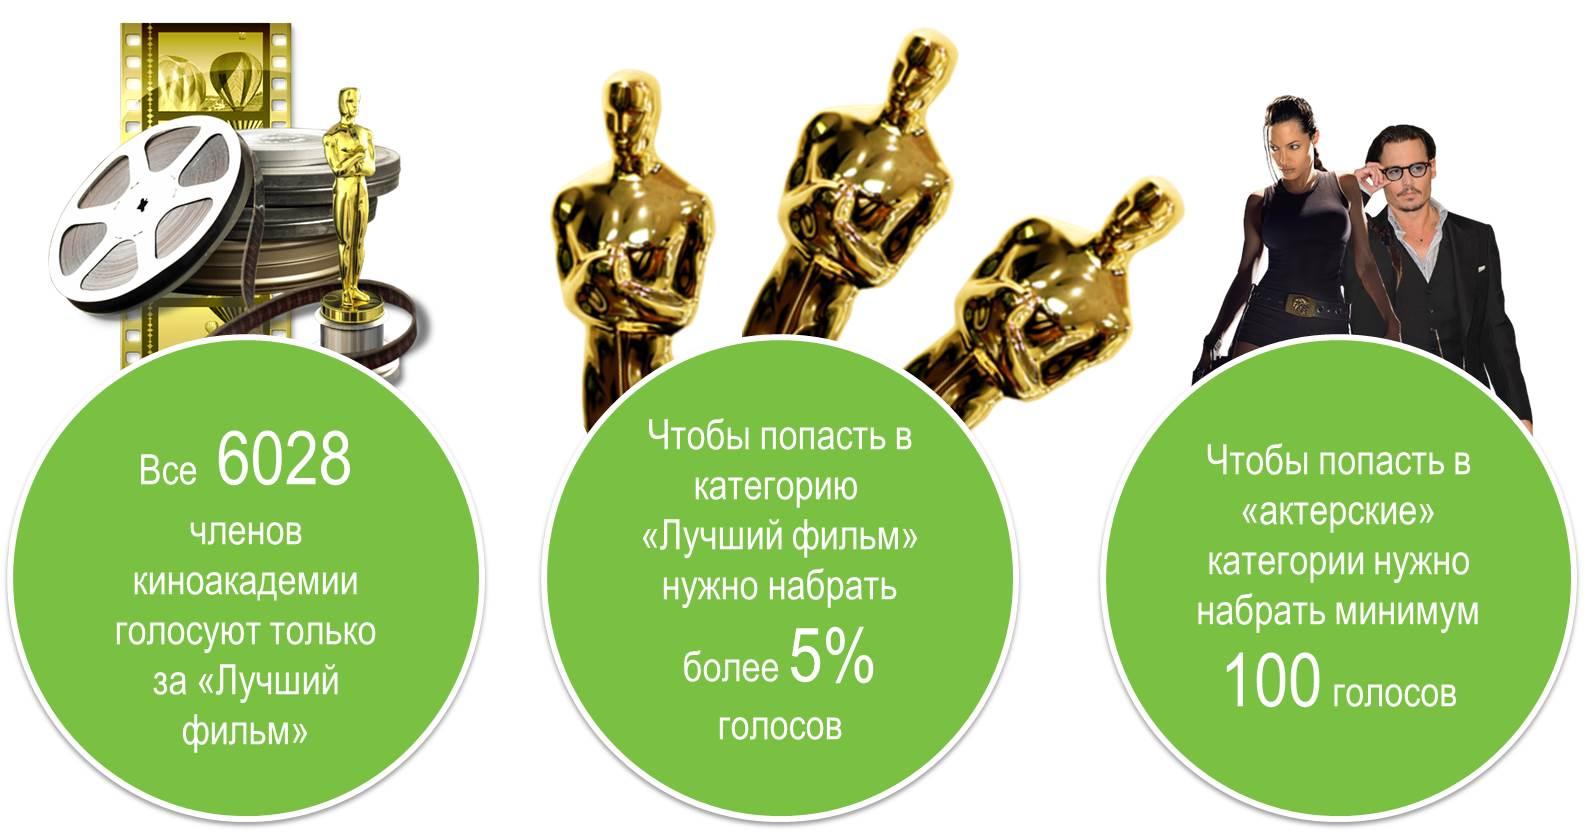 Как голосуют за Оскар